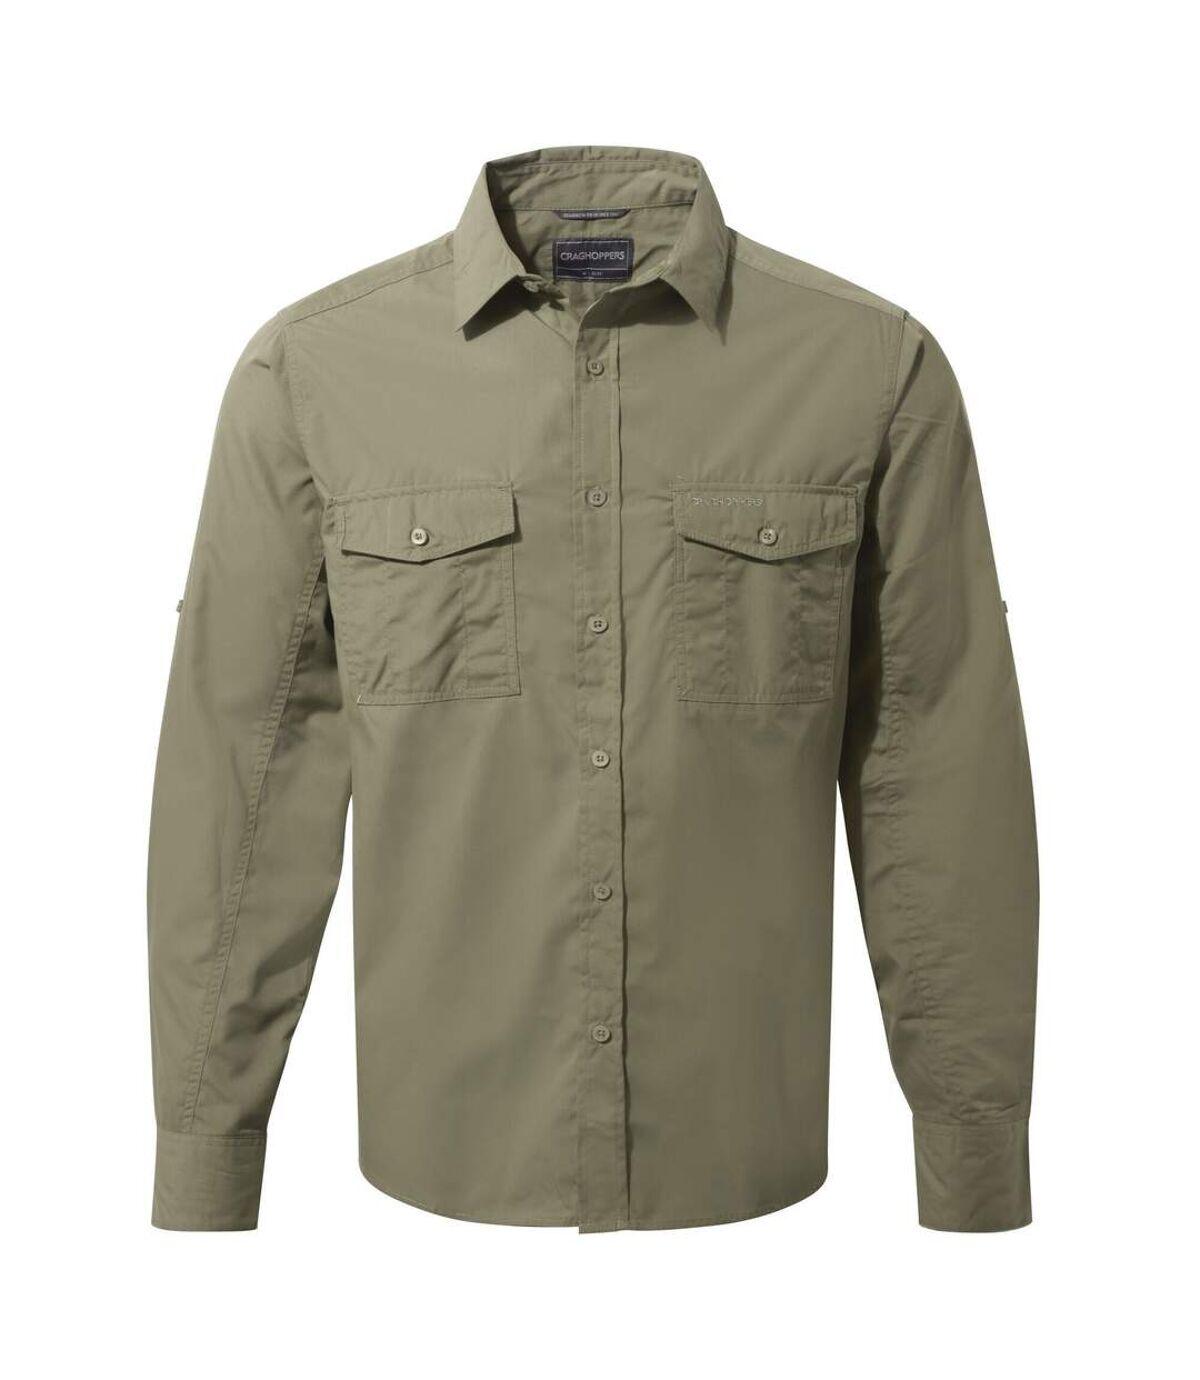 Craghoppers Mens Kiwi Long-Sleeved Shirt (Pebble Grey) - UTCG1500